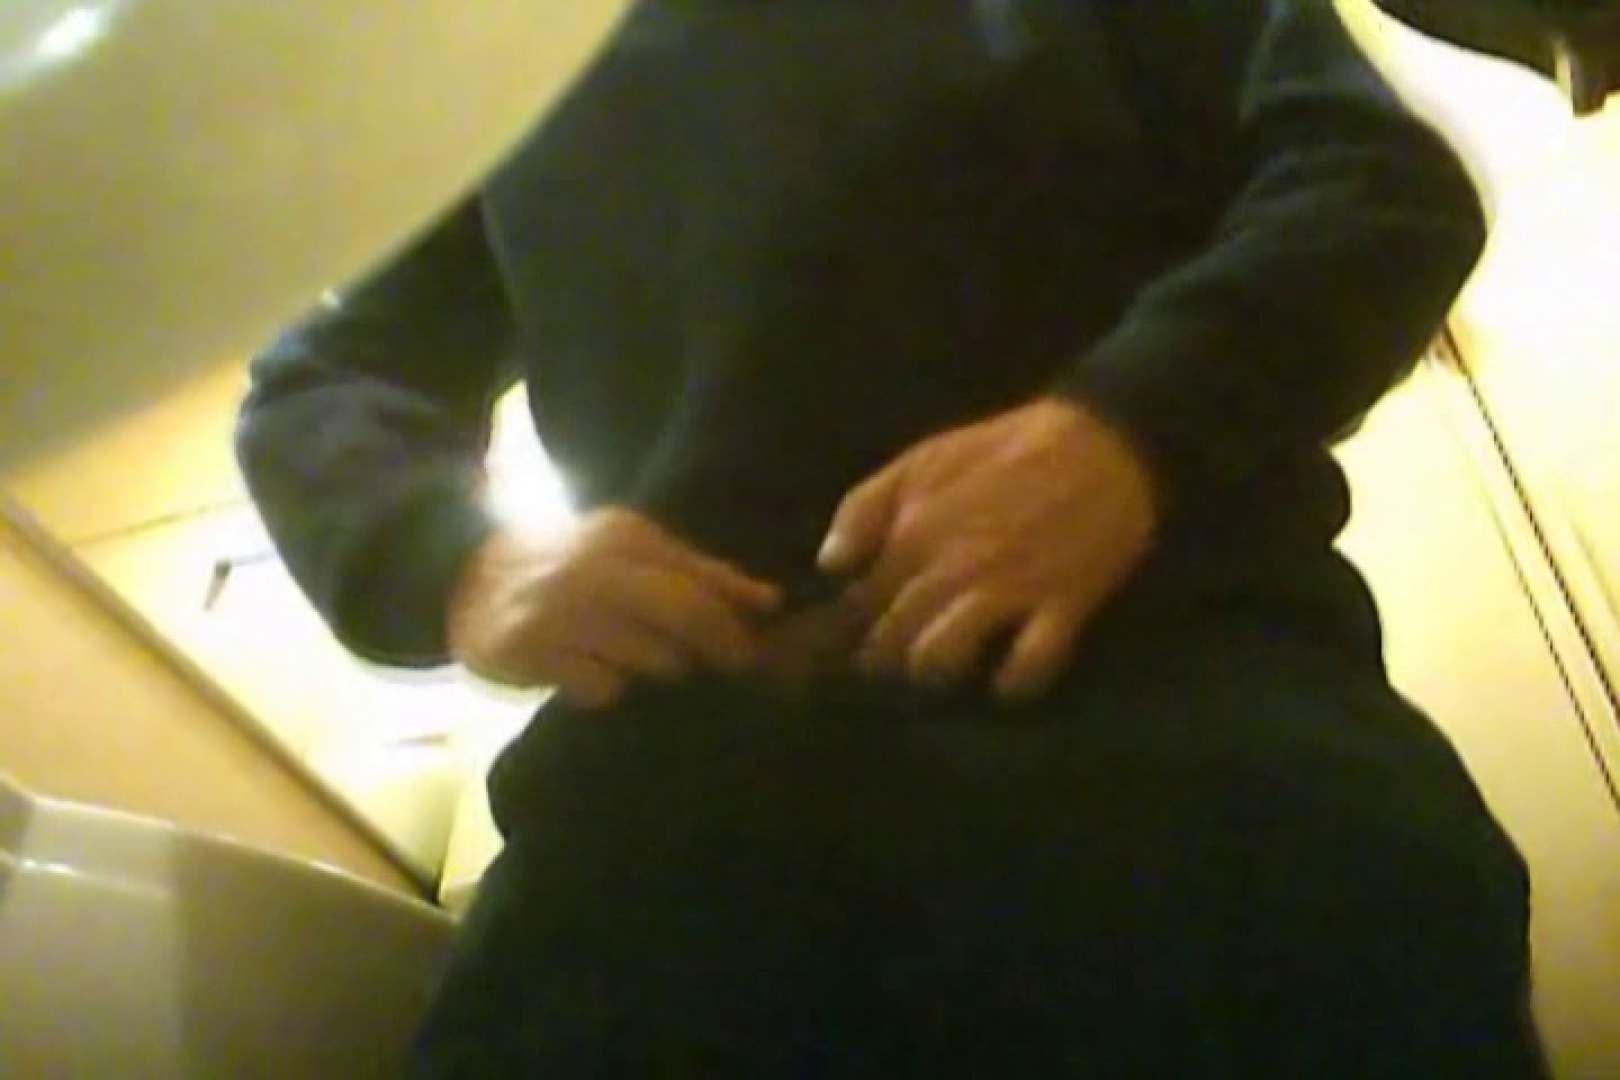 SEASON 3rd!掴み取りさんの洗面所覗き!in新幹線!VOL.03 スーツ ゲイ丸見え画像 71連発 15